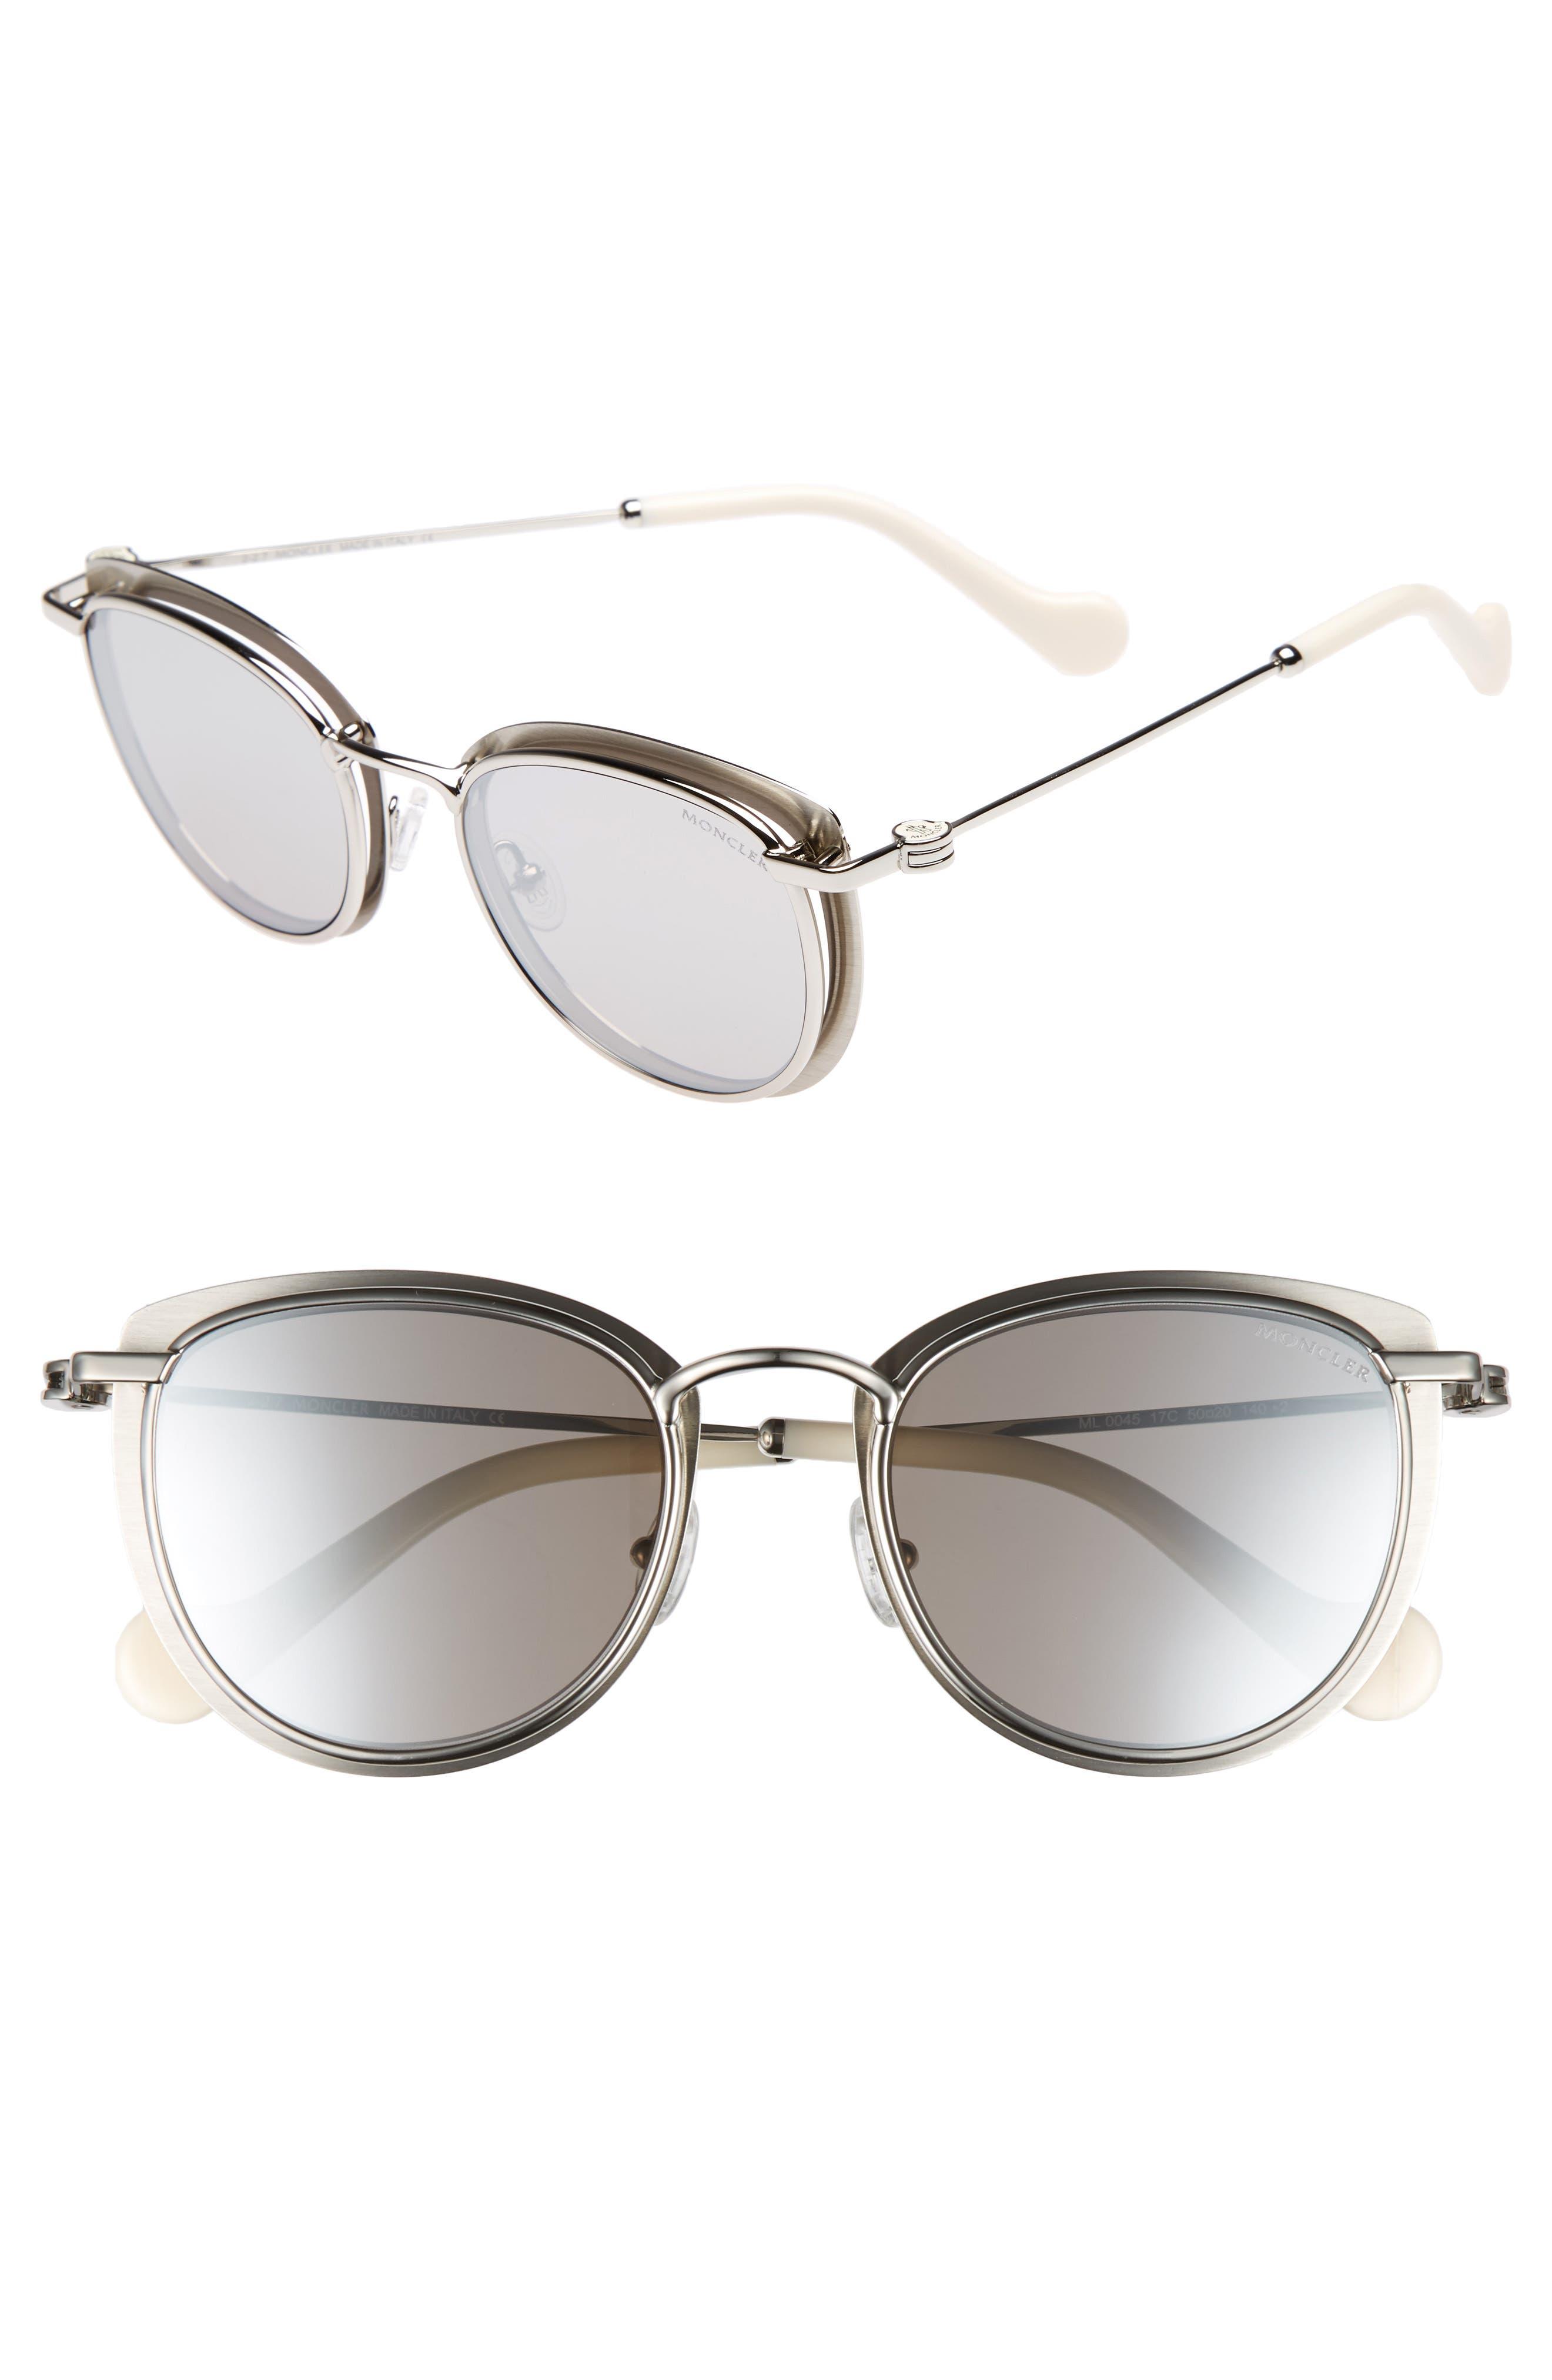 a957e24b9a67 Moncler 50Mm Mirrored Geometric Sunglasses - Paladium  White  Smoke  Silver